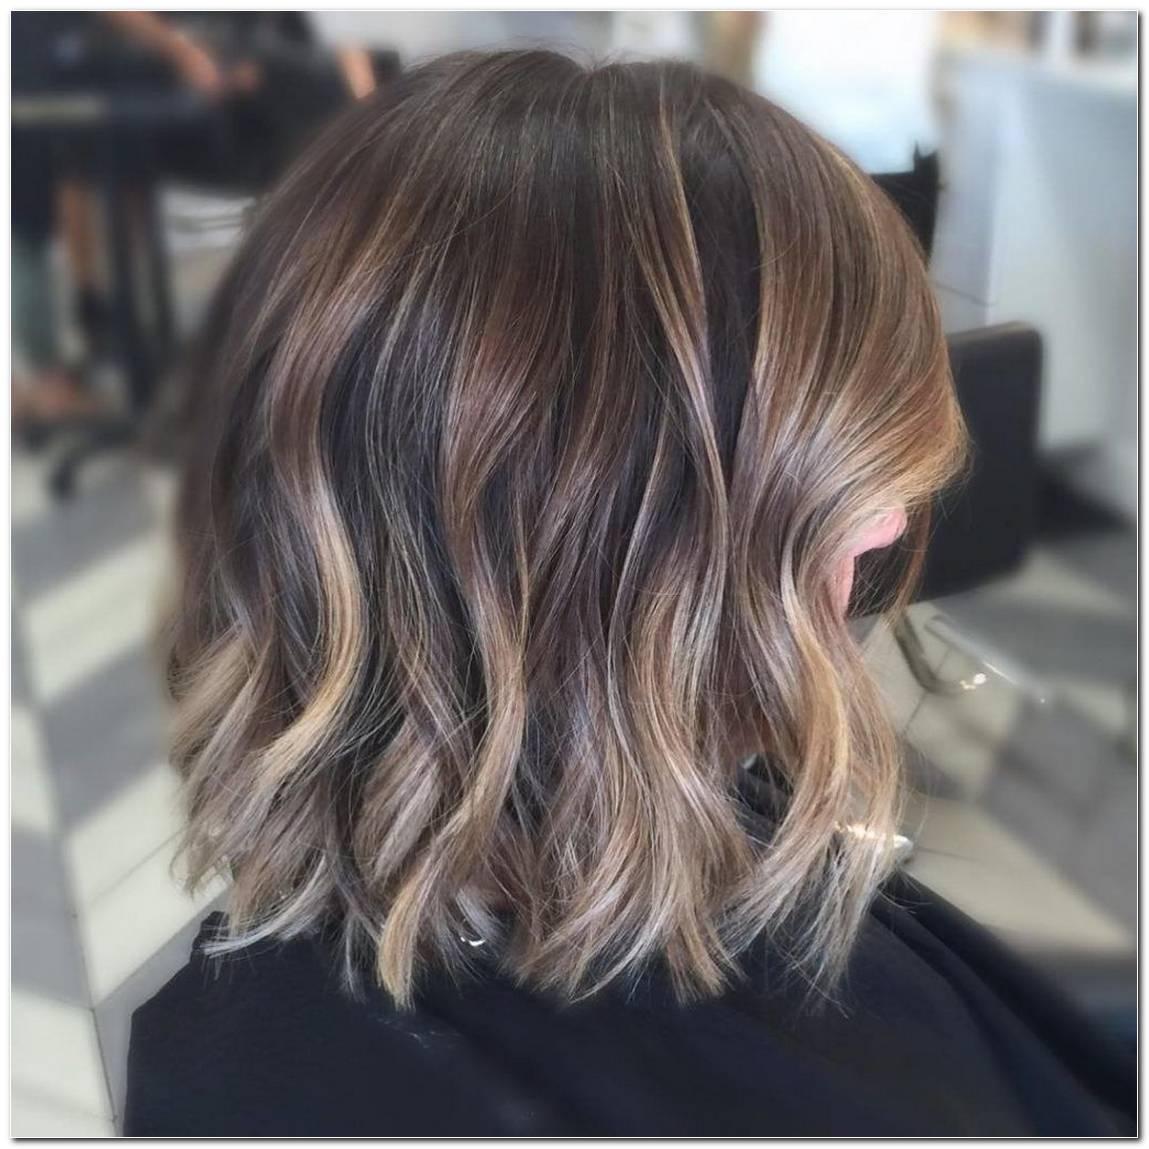 Frisuren Dunkle Haare Mittellang